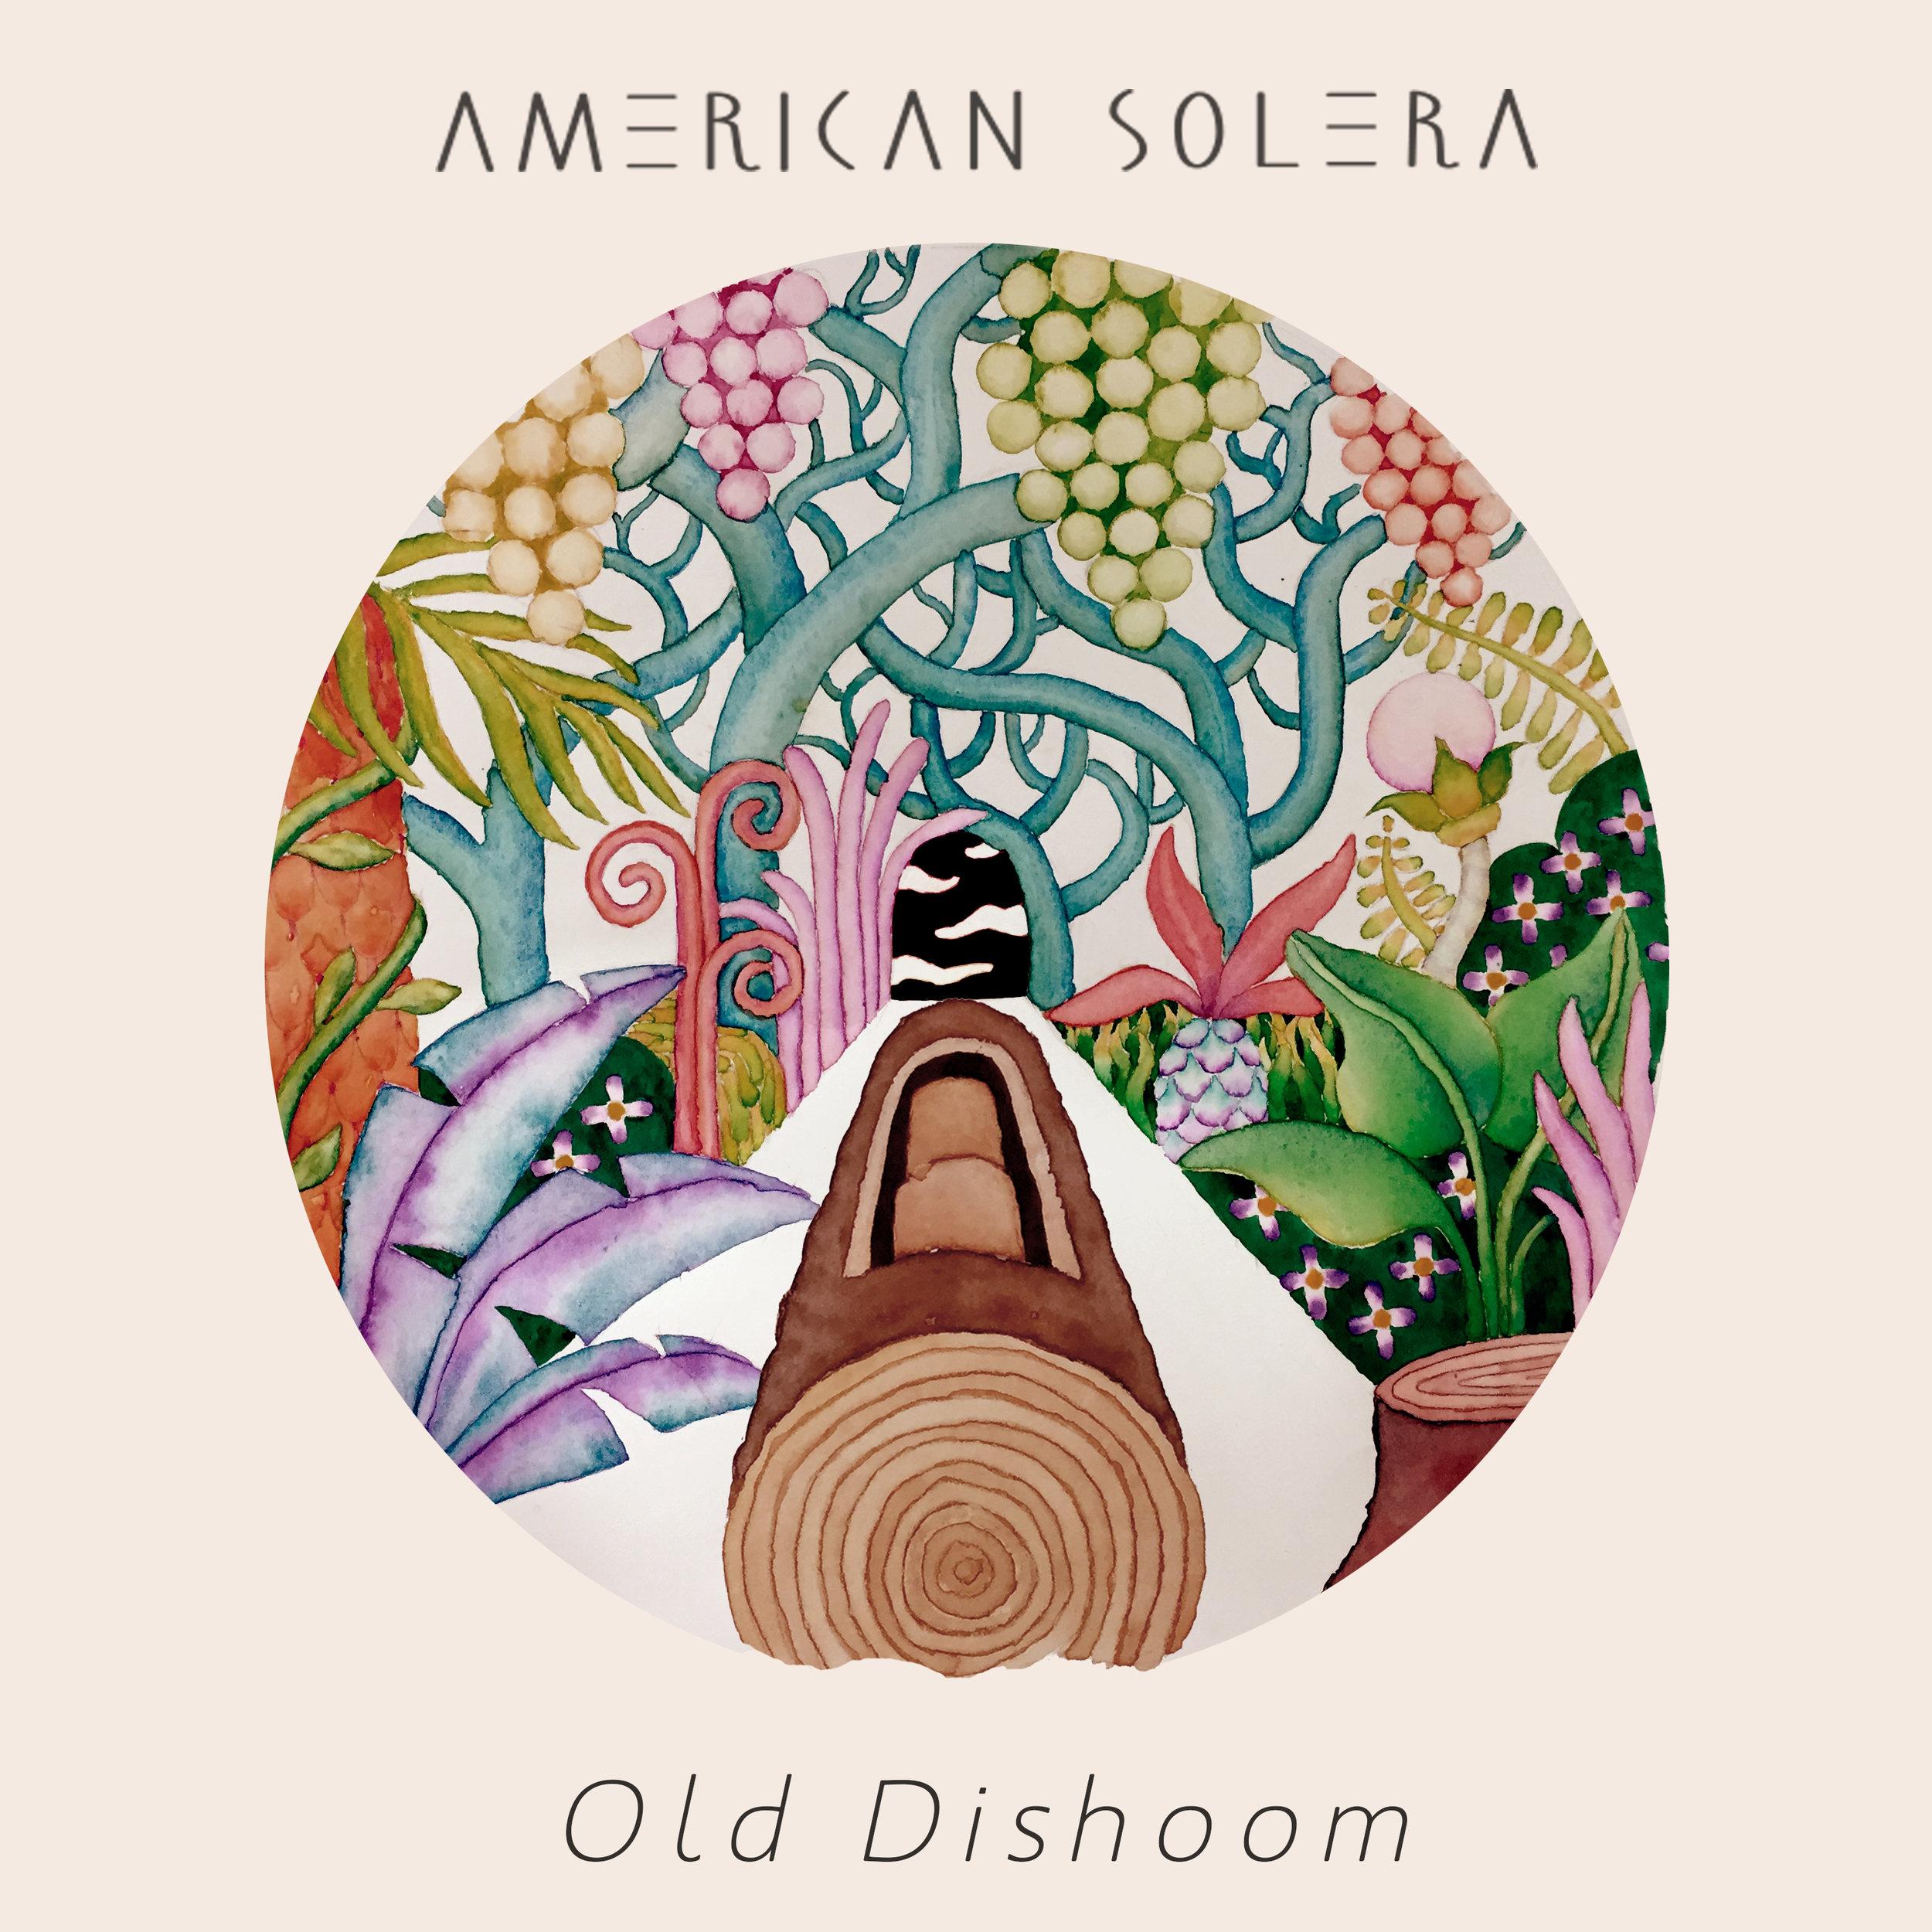 american solera - old dishoom v12.jpg